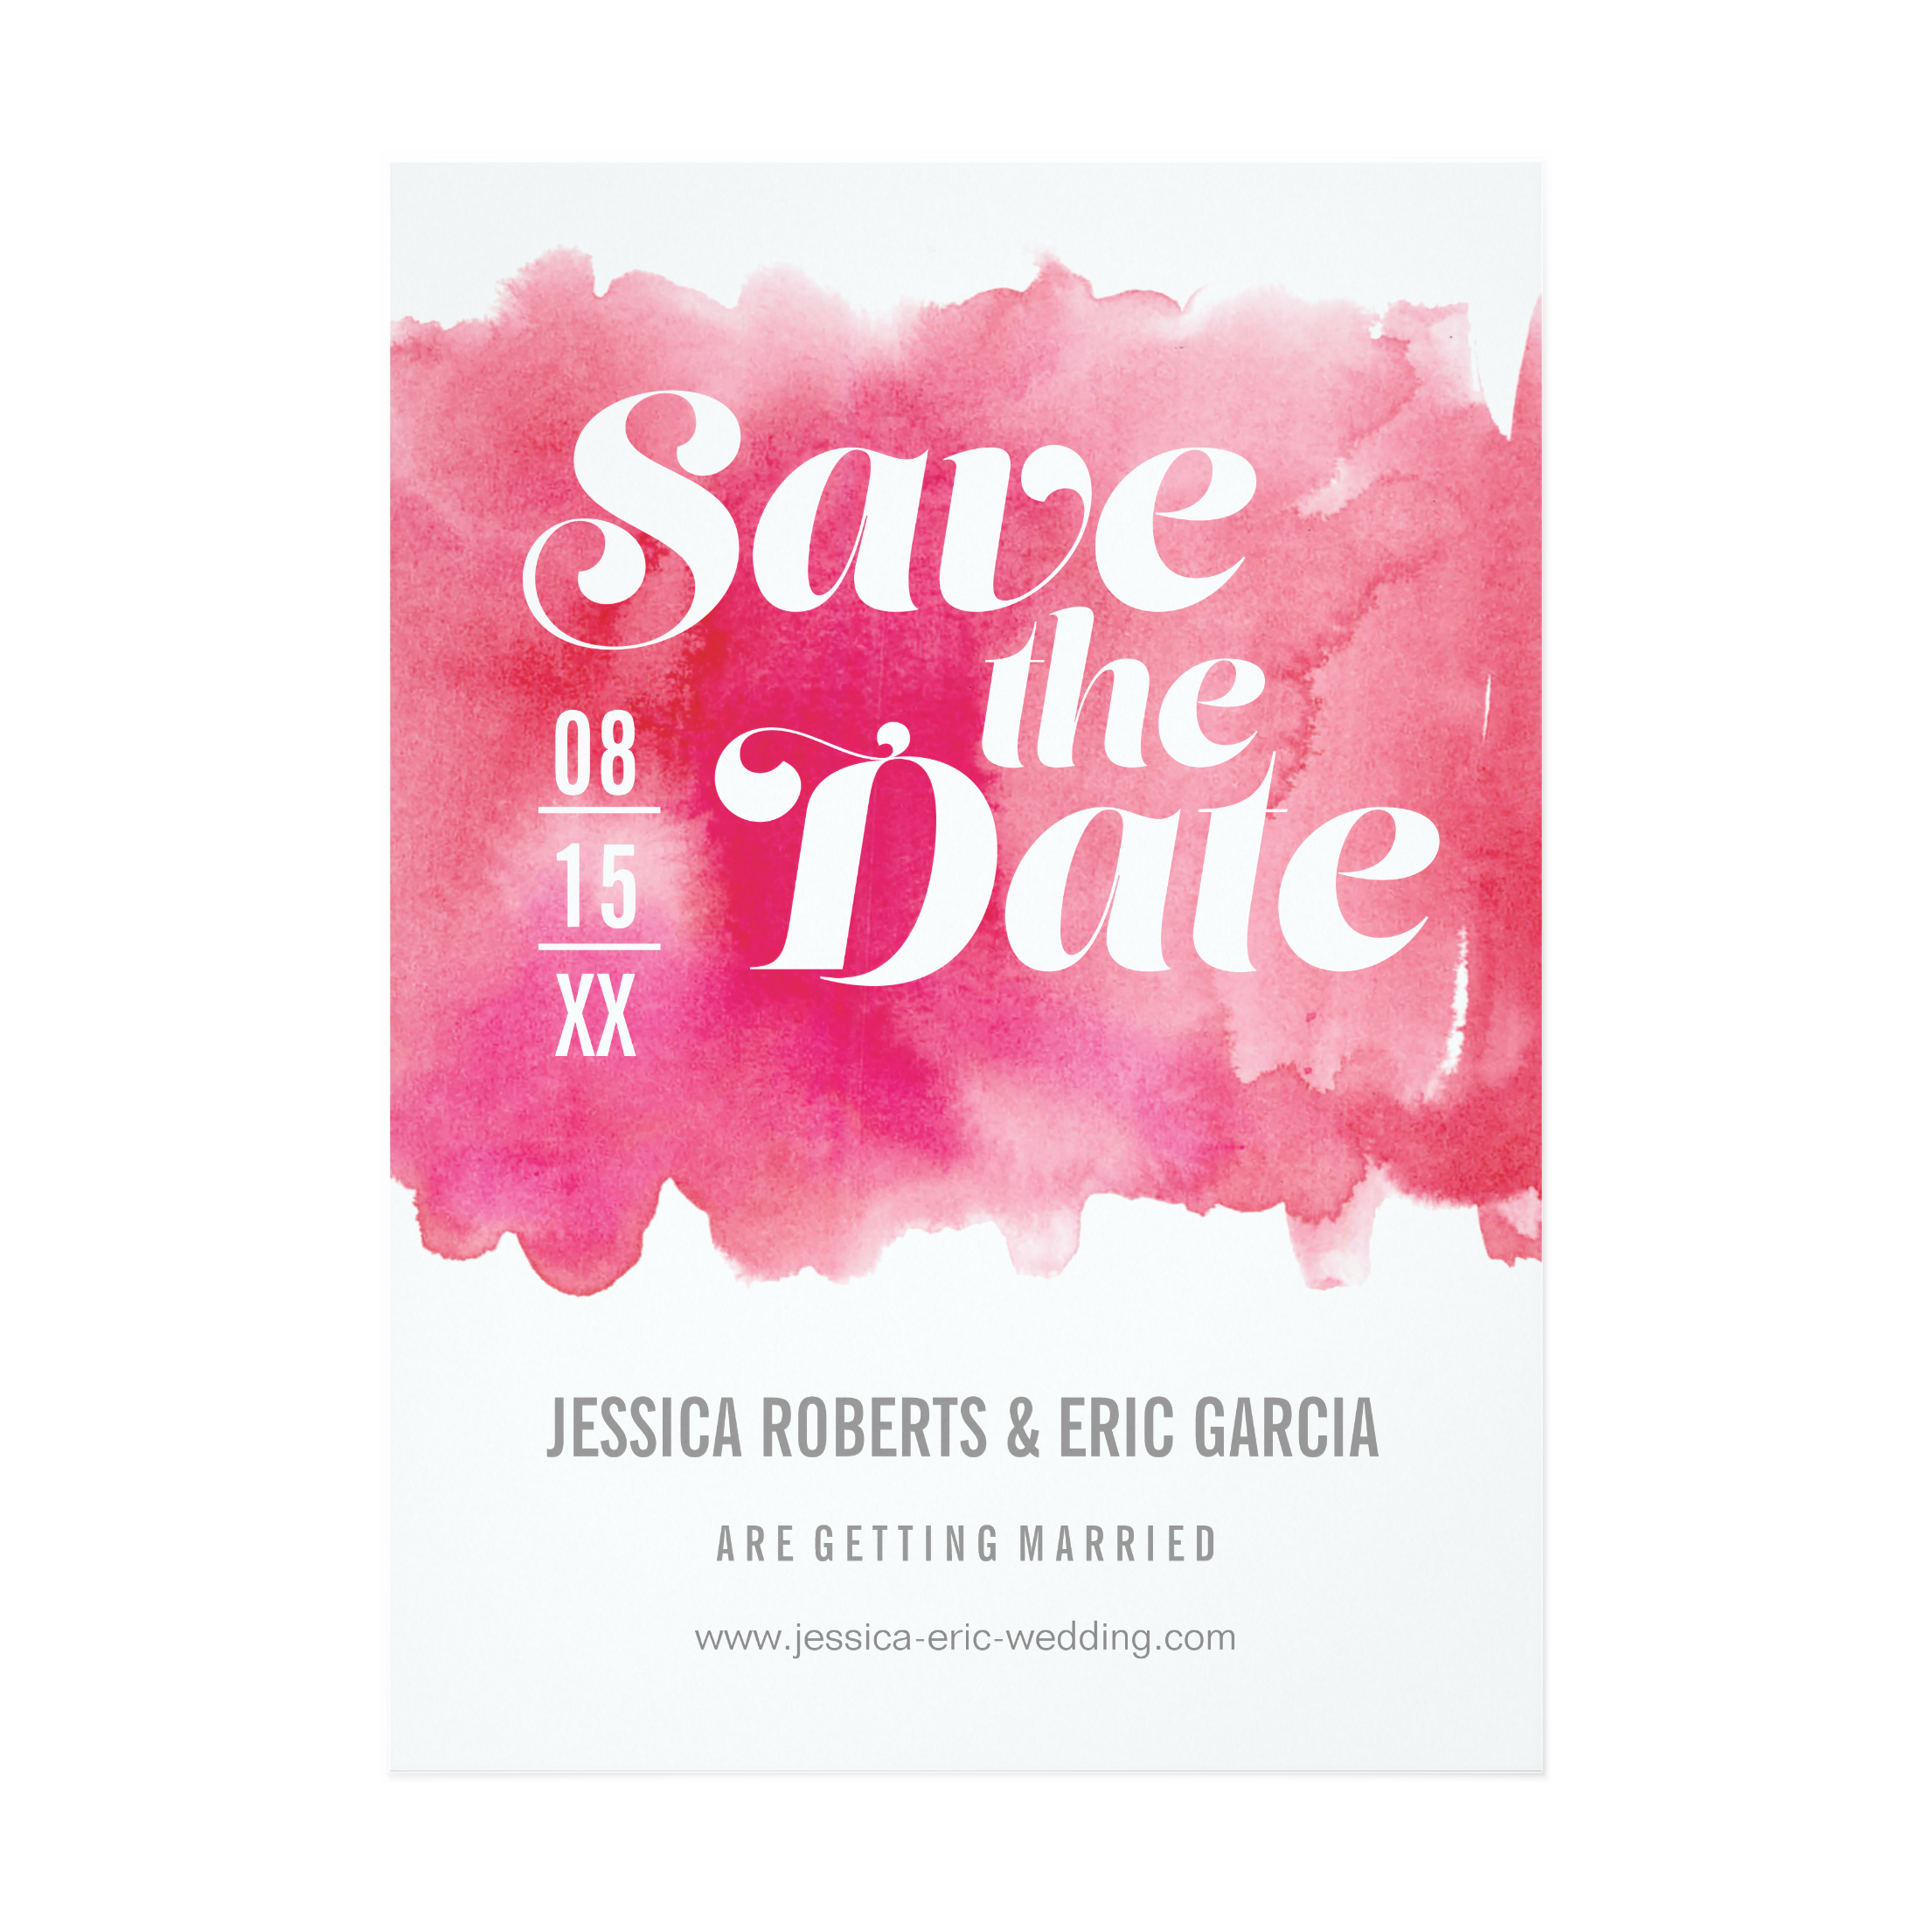 Hot Pink Watercolor Invitation